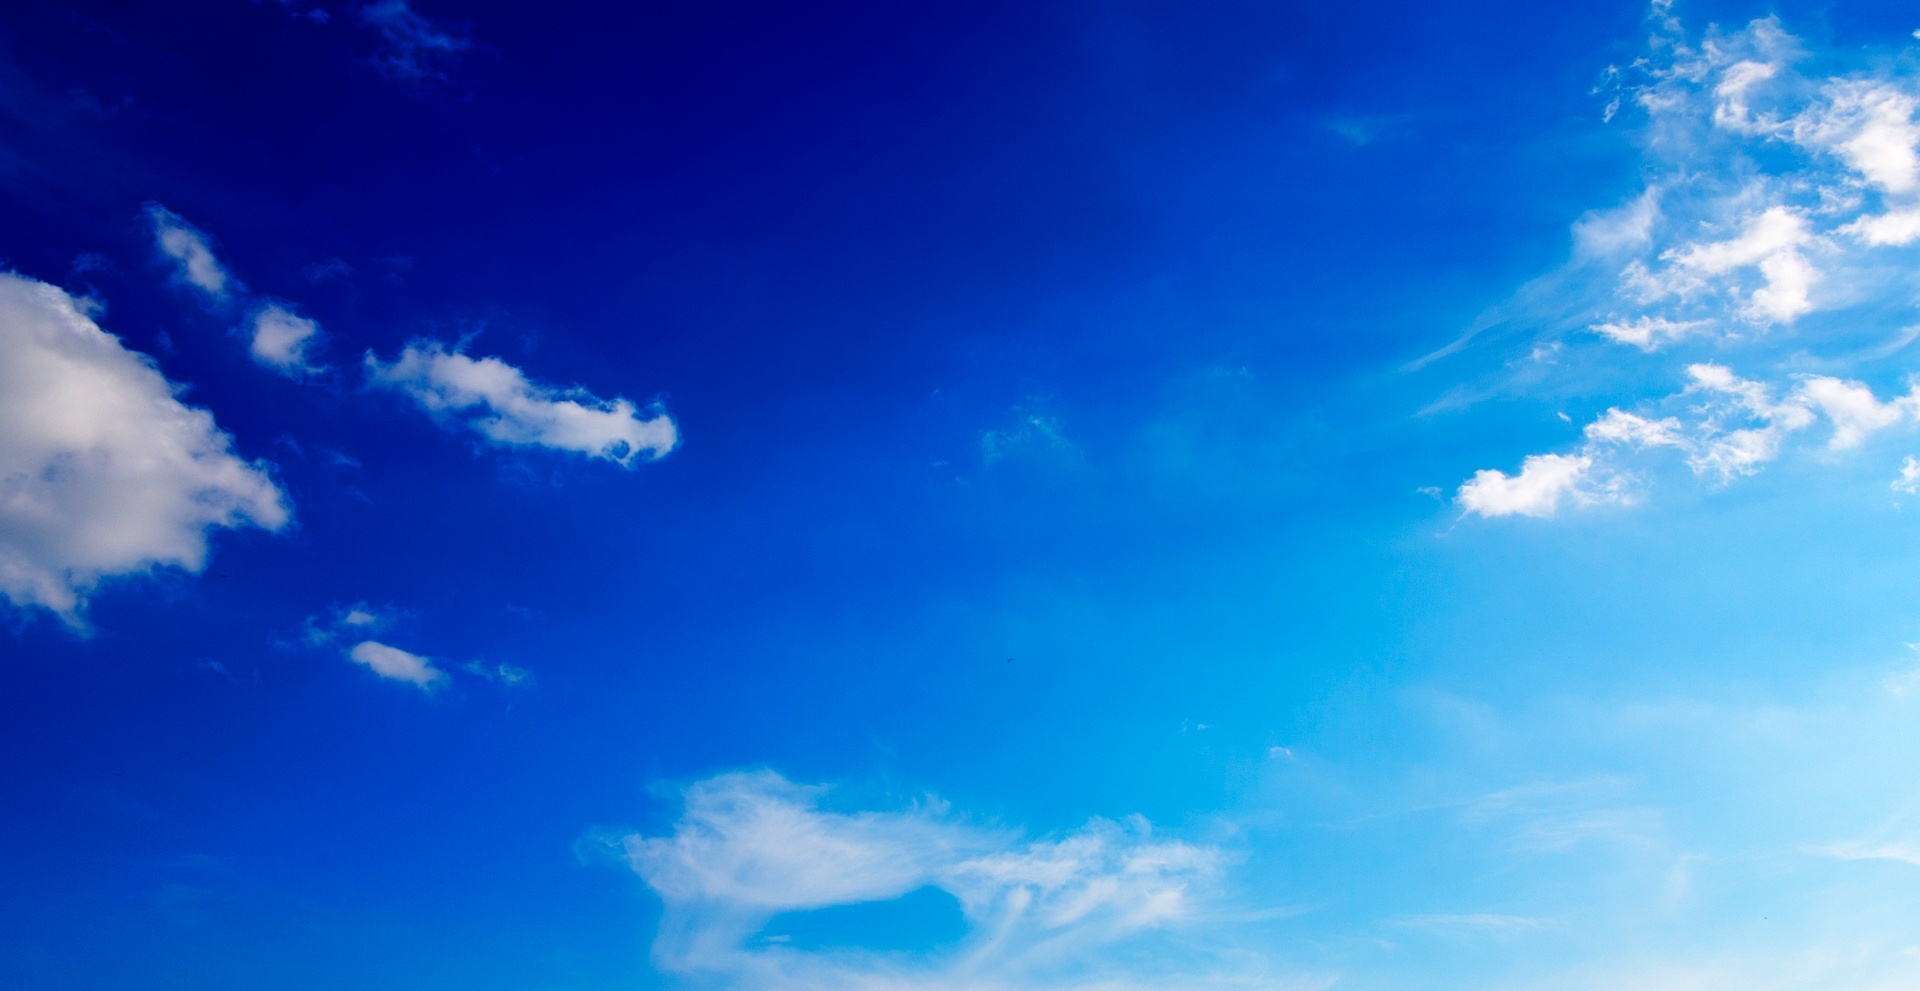 Blue Sky Background Wallpaper - WallpaperSafari